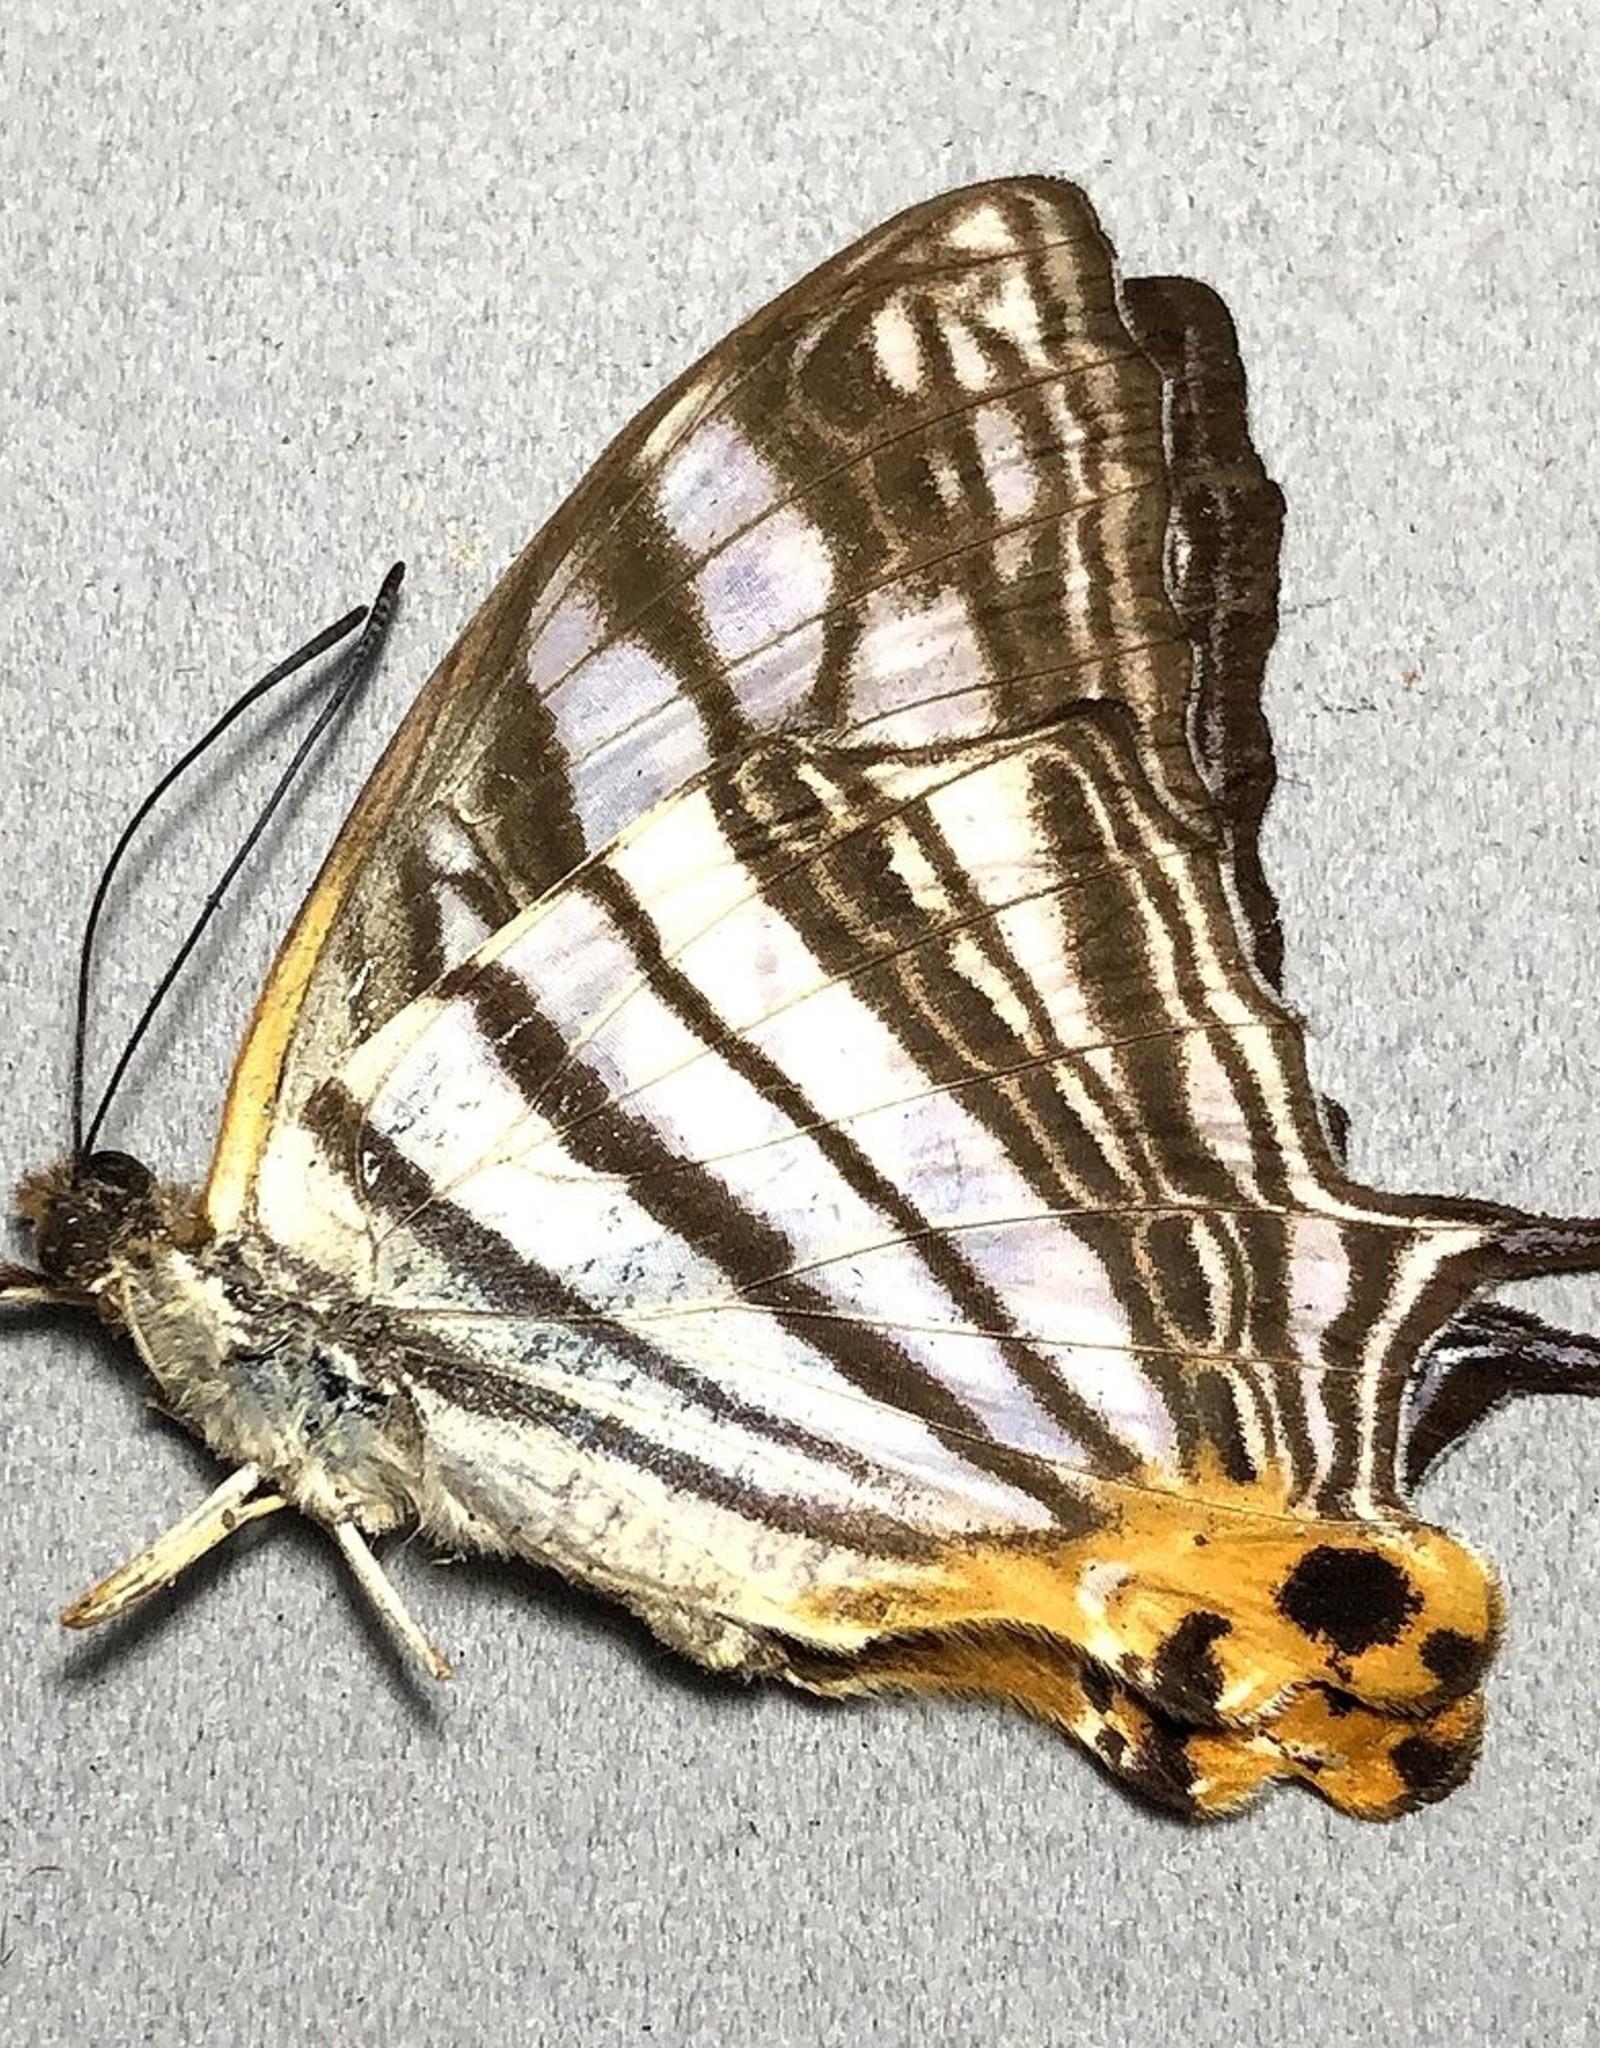 Cyrestis maenalis M A1 Philippines